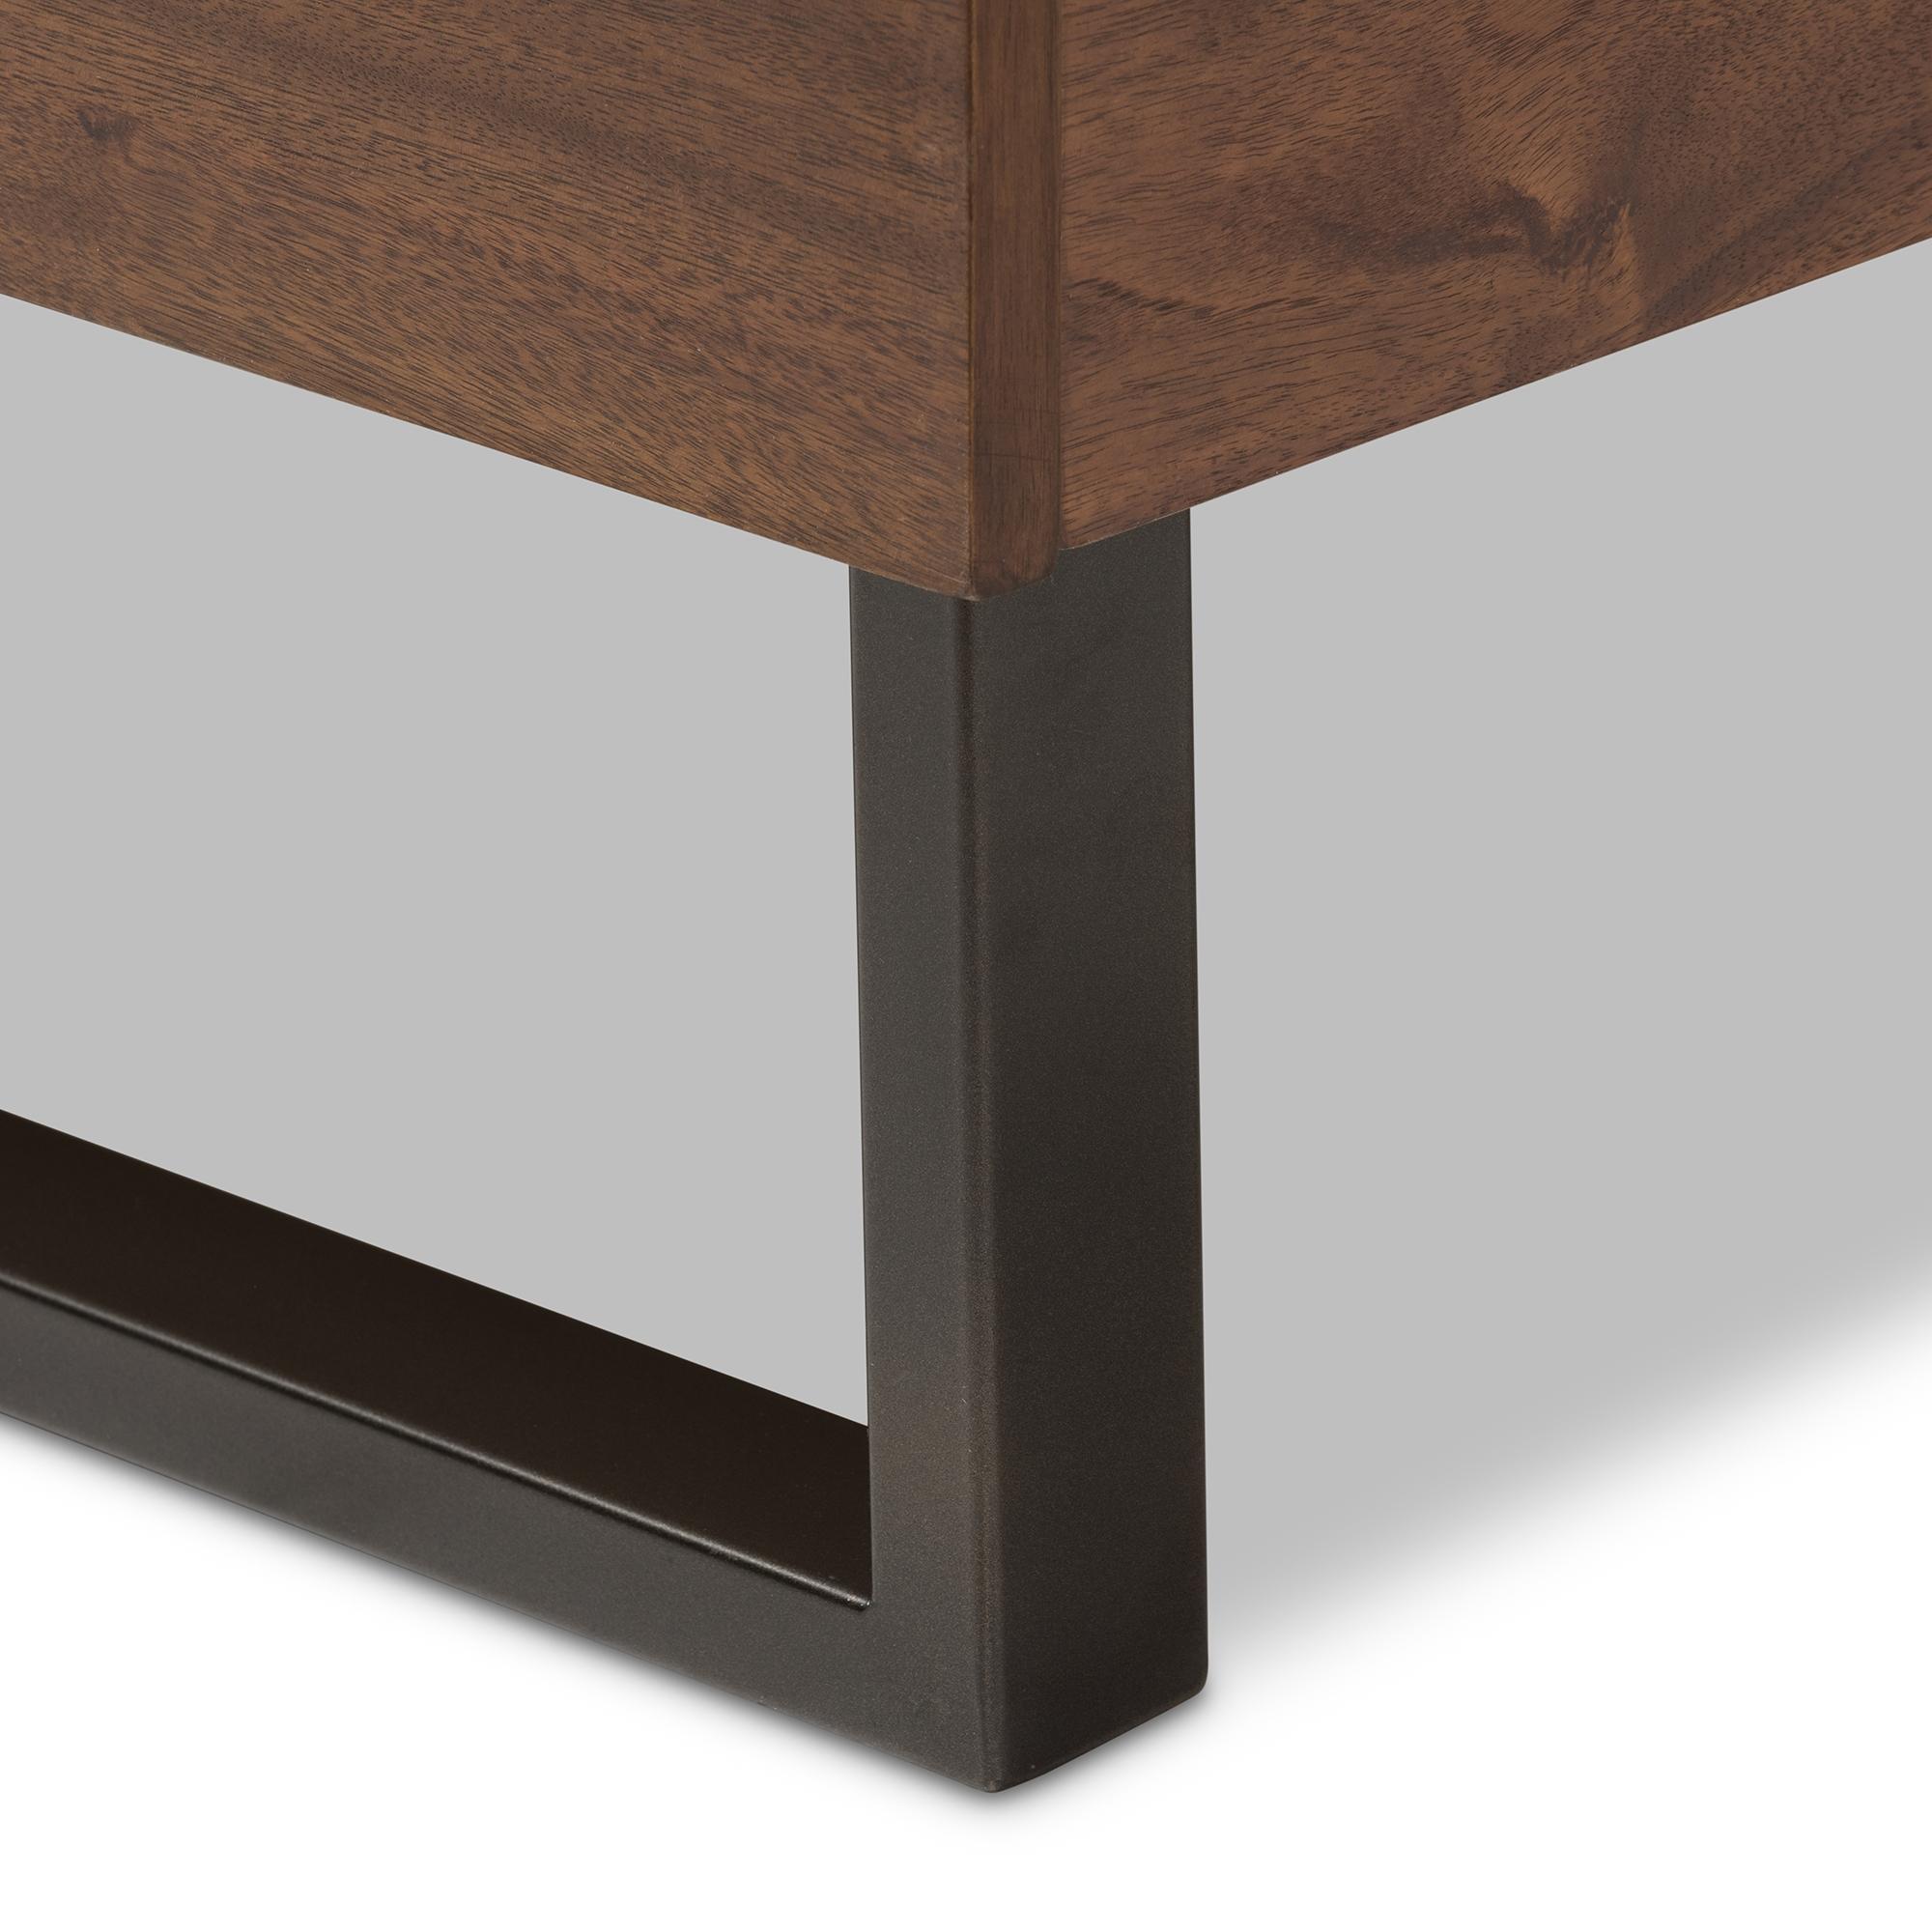 baxton studio mitchell rustic industrial walnut wood grey fabric dark bronze metal king size platform bed